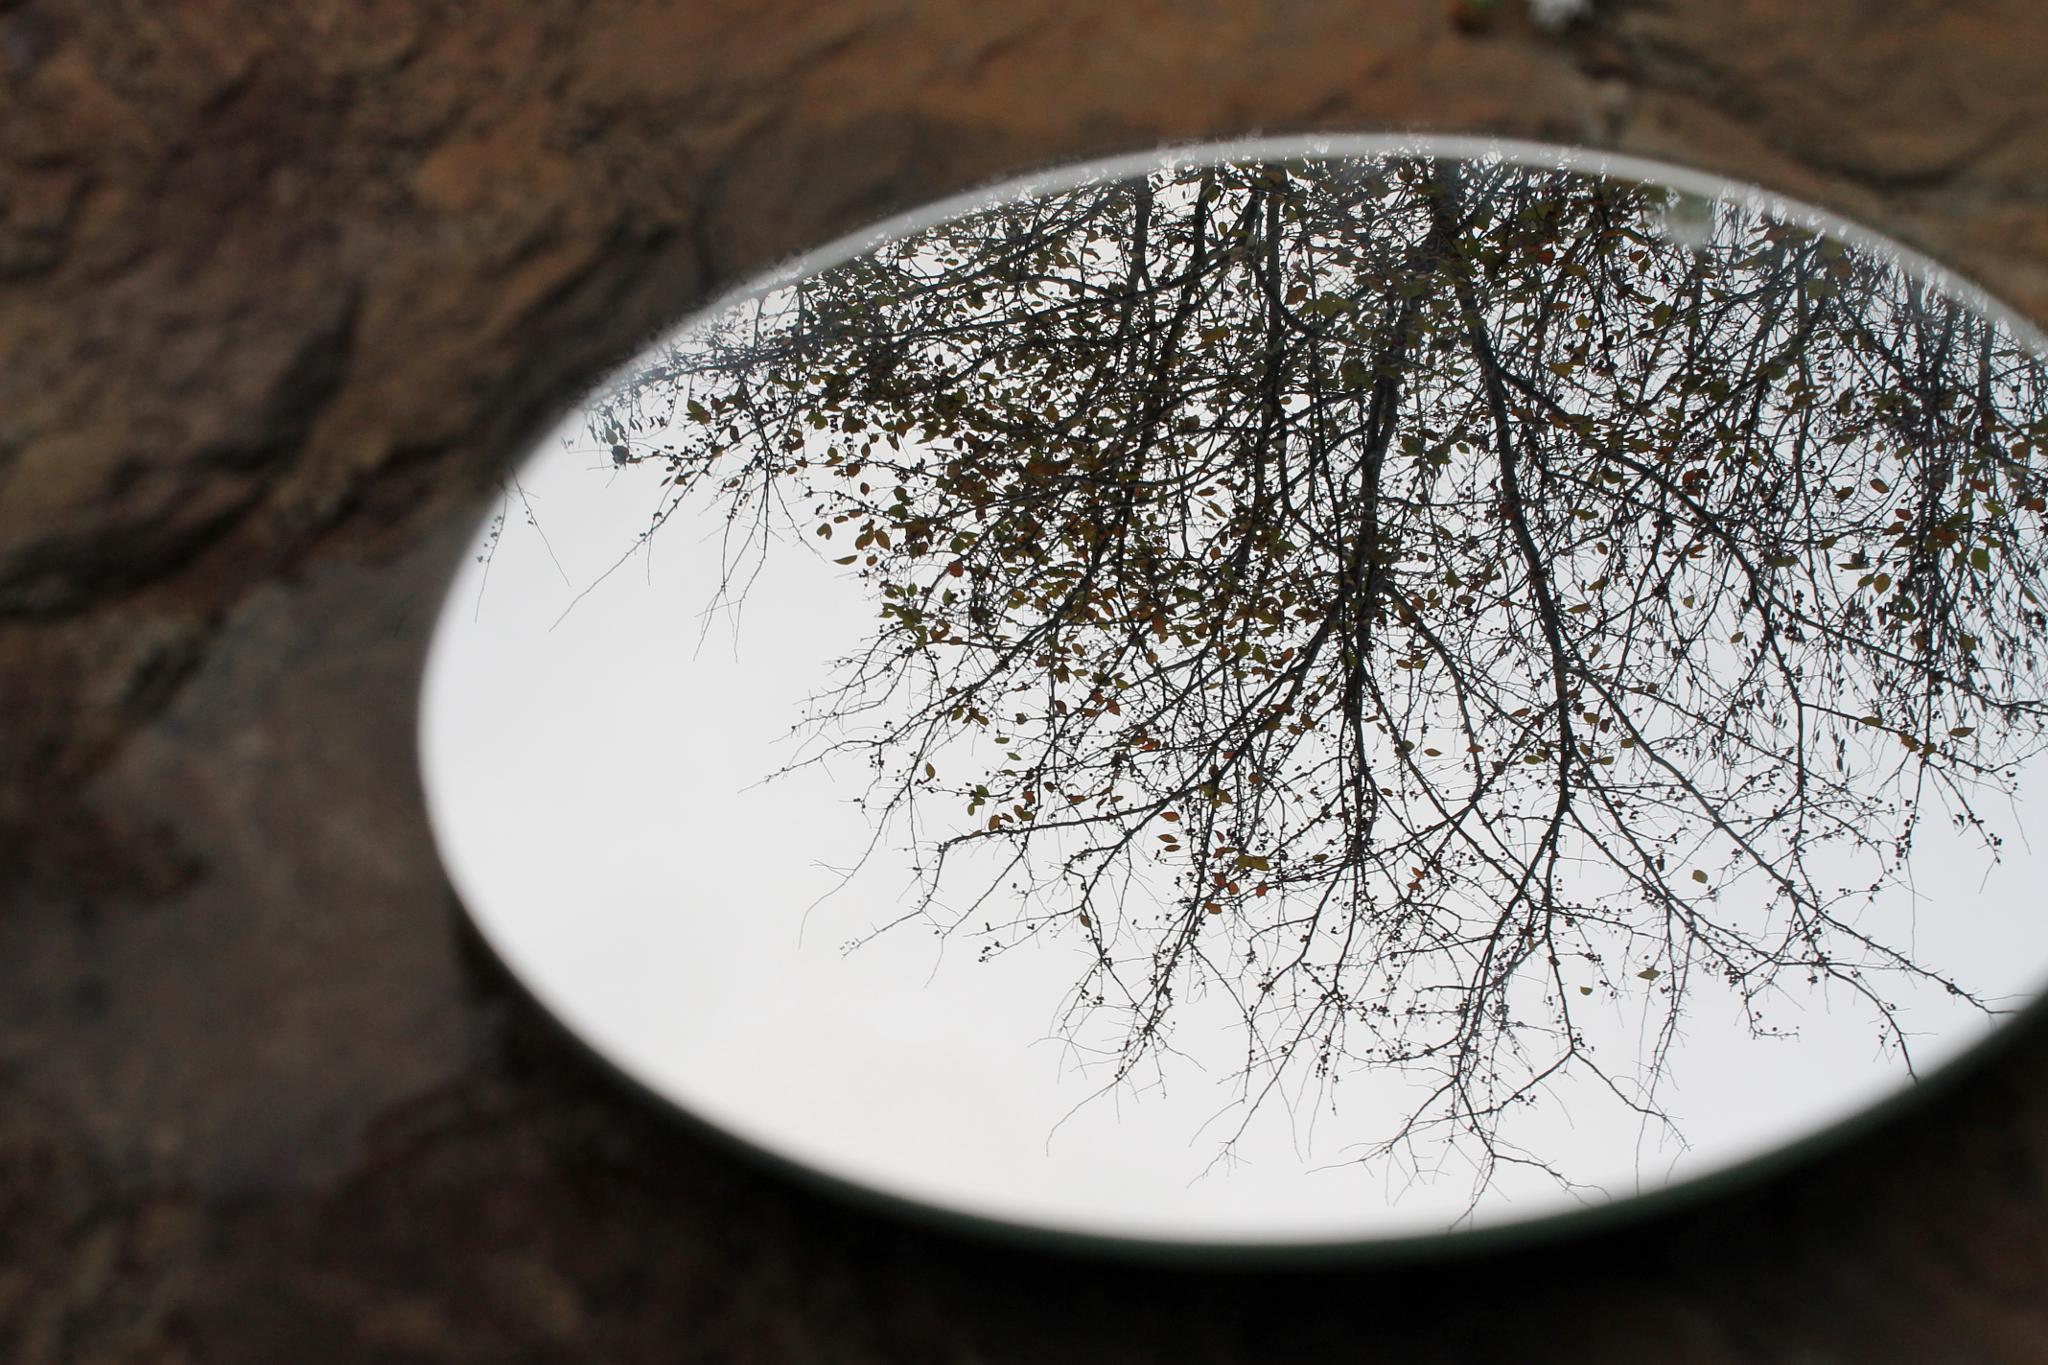 Fall Reflections by kasey.bragg